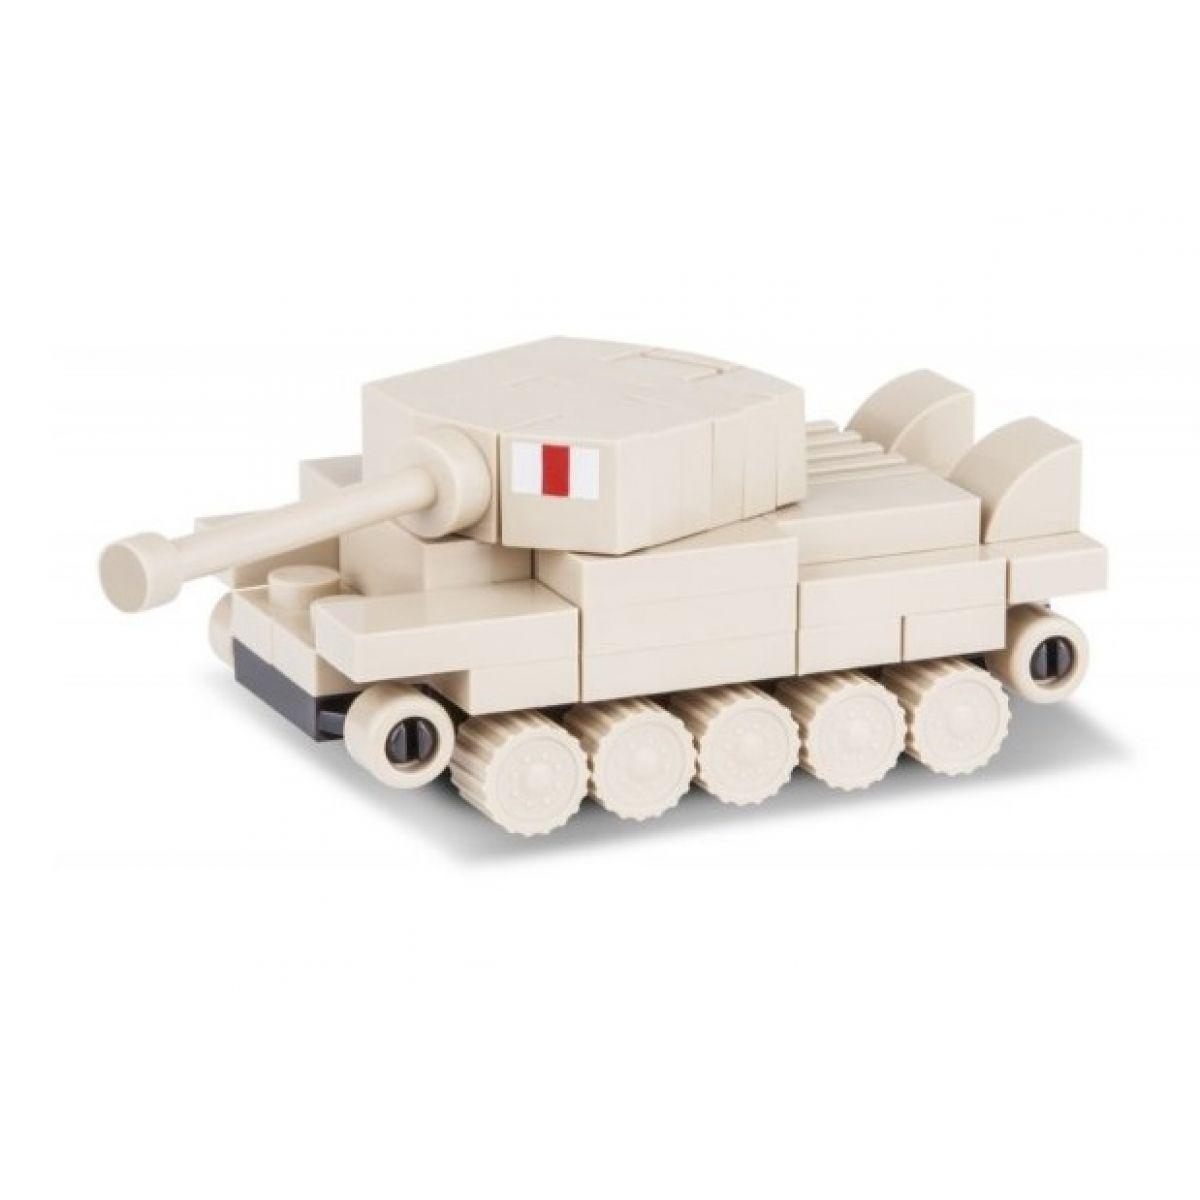 COBI 3018 WORLD of TANKS Nano Tank Cromwell 72 k